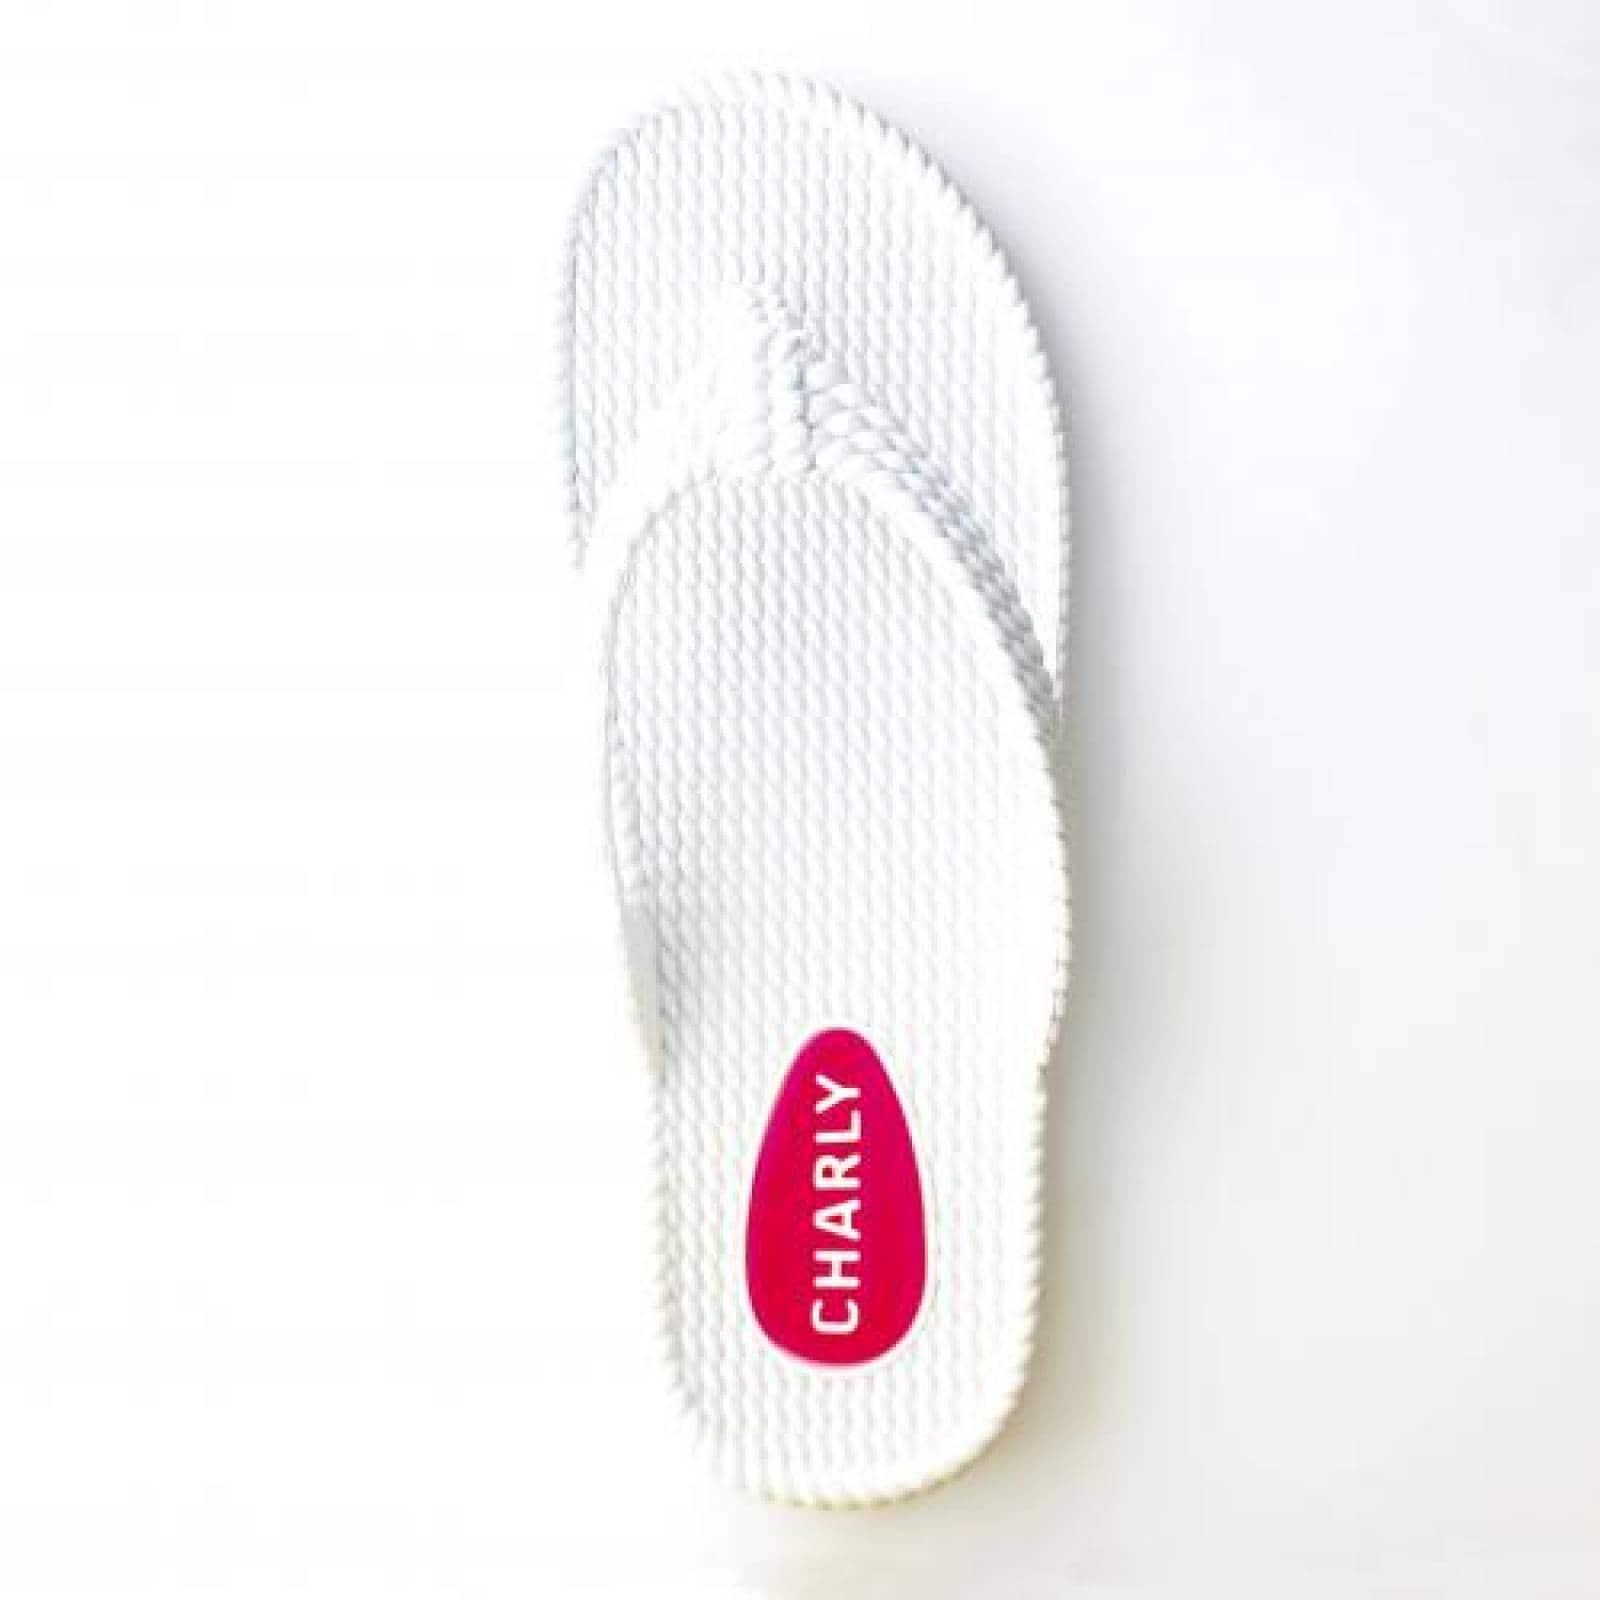 Sandalia para Mujer Charly Consigna 1090190 041654 Color Blanco